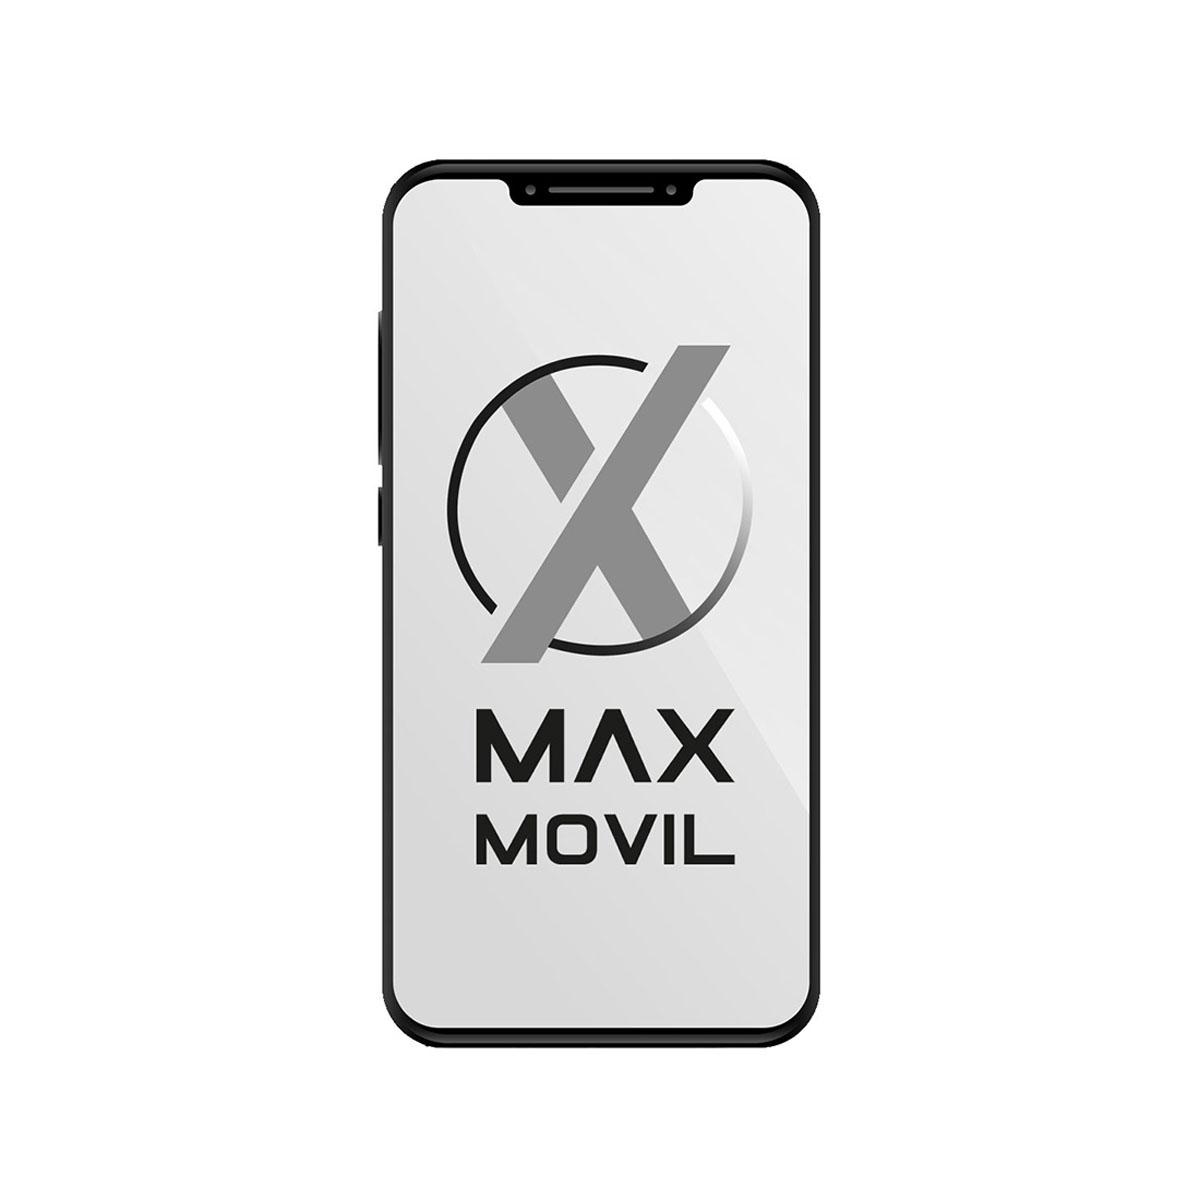 Comprar Motorola Moto Z Blanco Xt1650 Libre 183 Maxmovil ⓴⓲